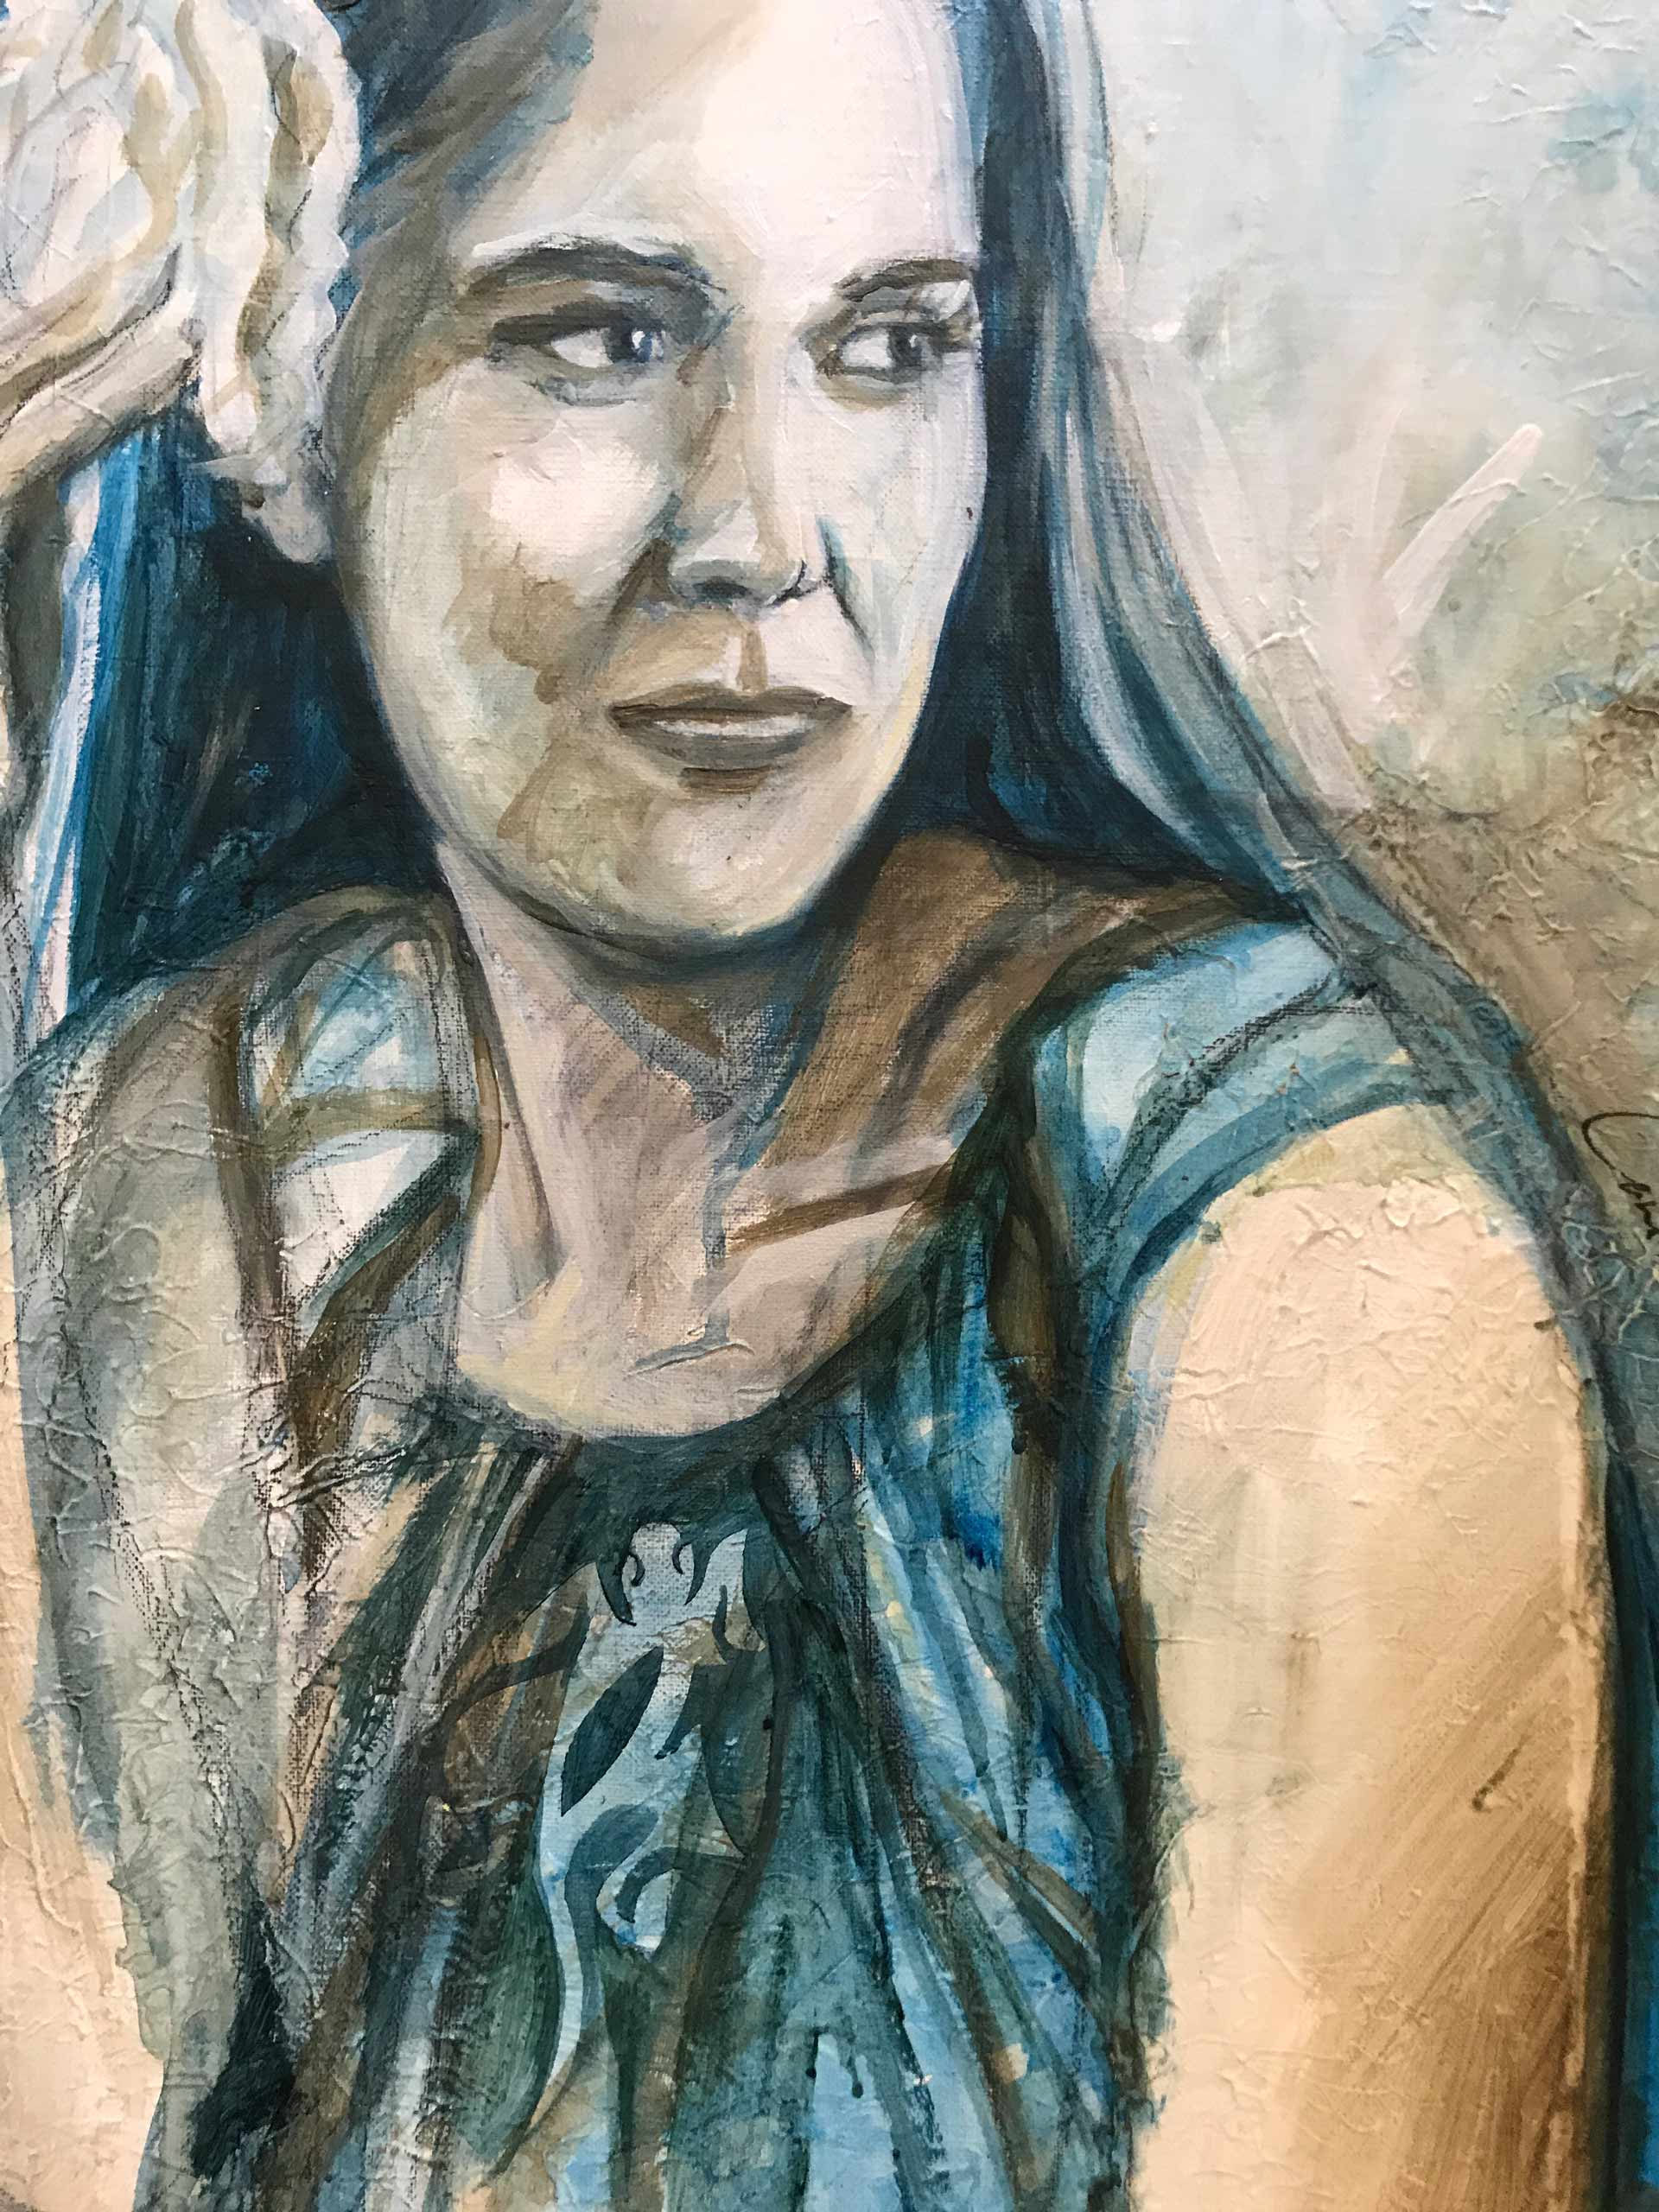 #art_in_studio, #artstudio, #studio, #artisstudio, #artislife, #art life, #artoftheday, #oilpainting, #paintings, #painter, #fineart, #frenchpolynesiaartist, #tahiti, #drawing, #artofdrawing, #vahine, #nude,